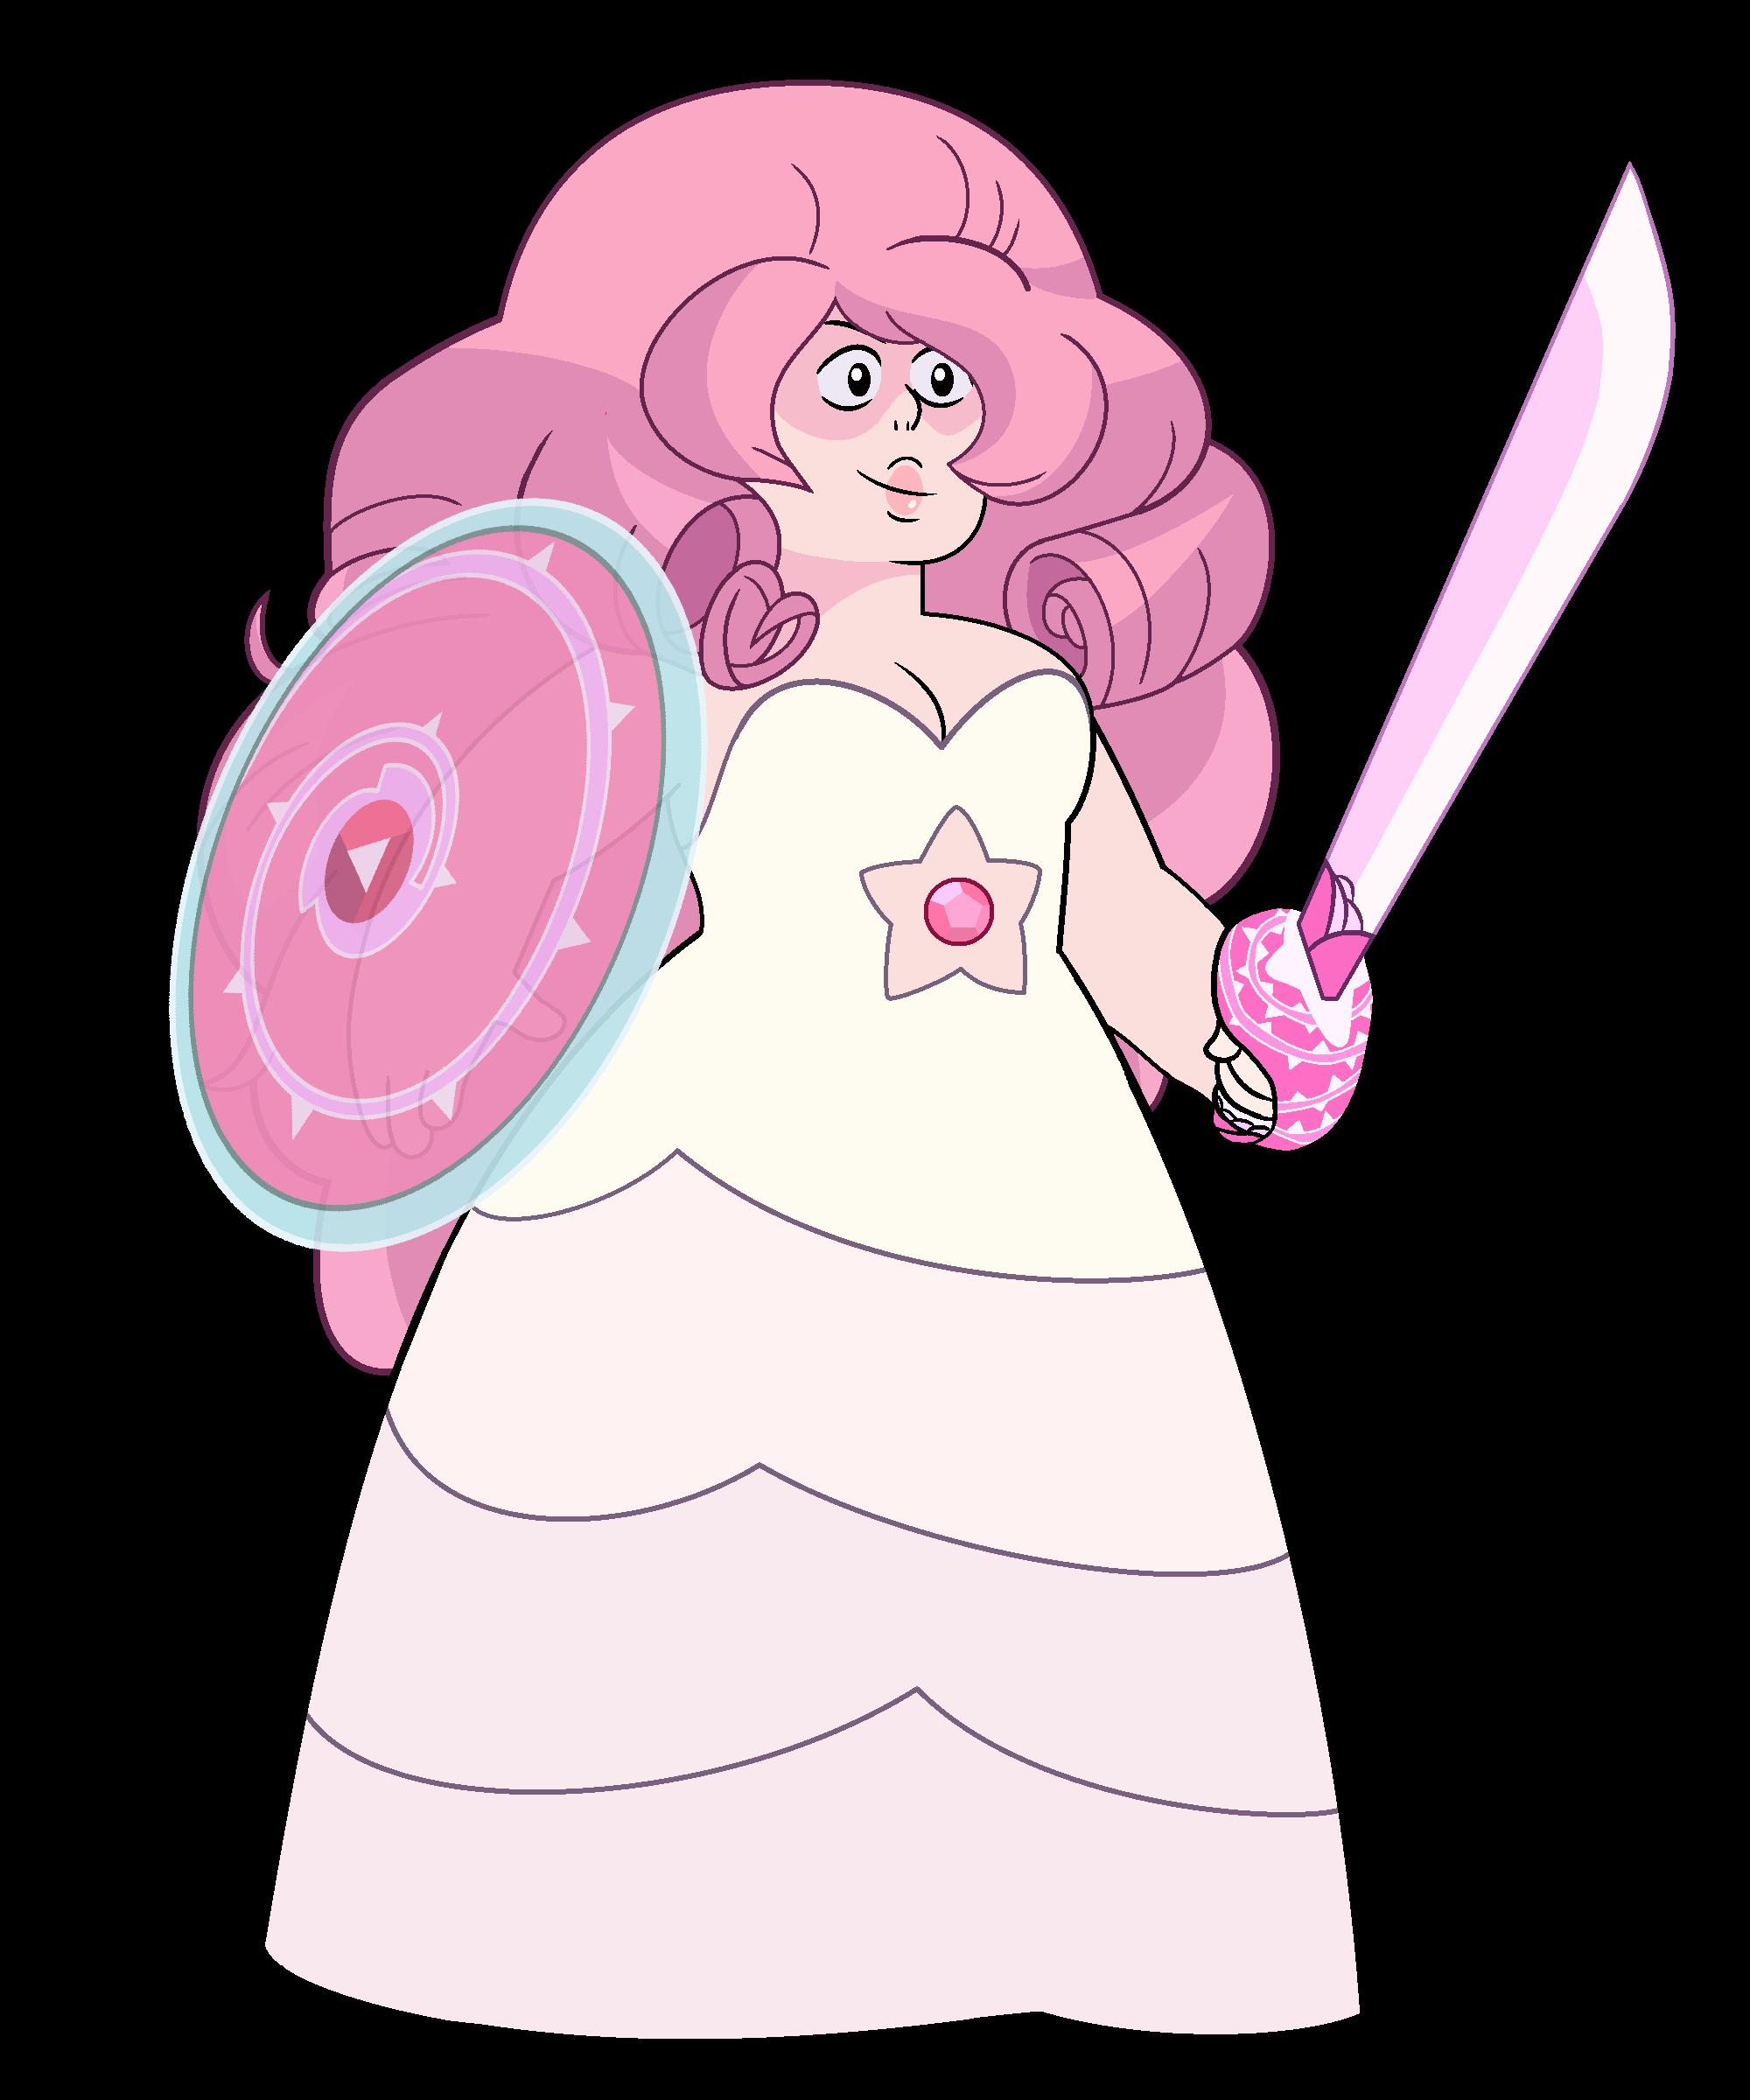 Rose Quartz Steven Universe Wiki Fandom